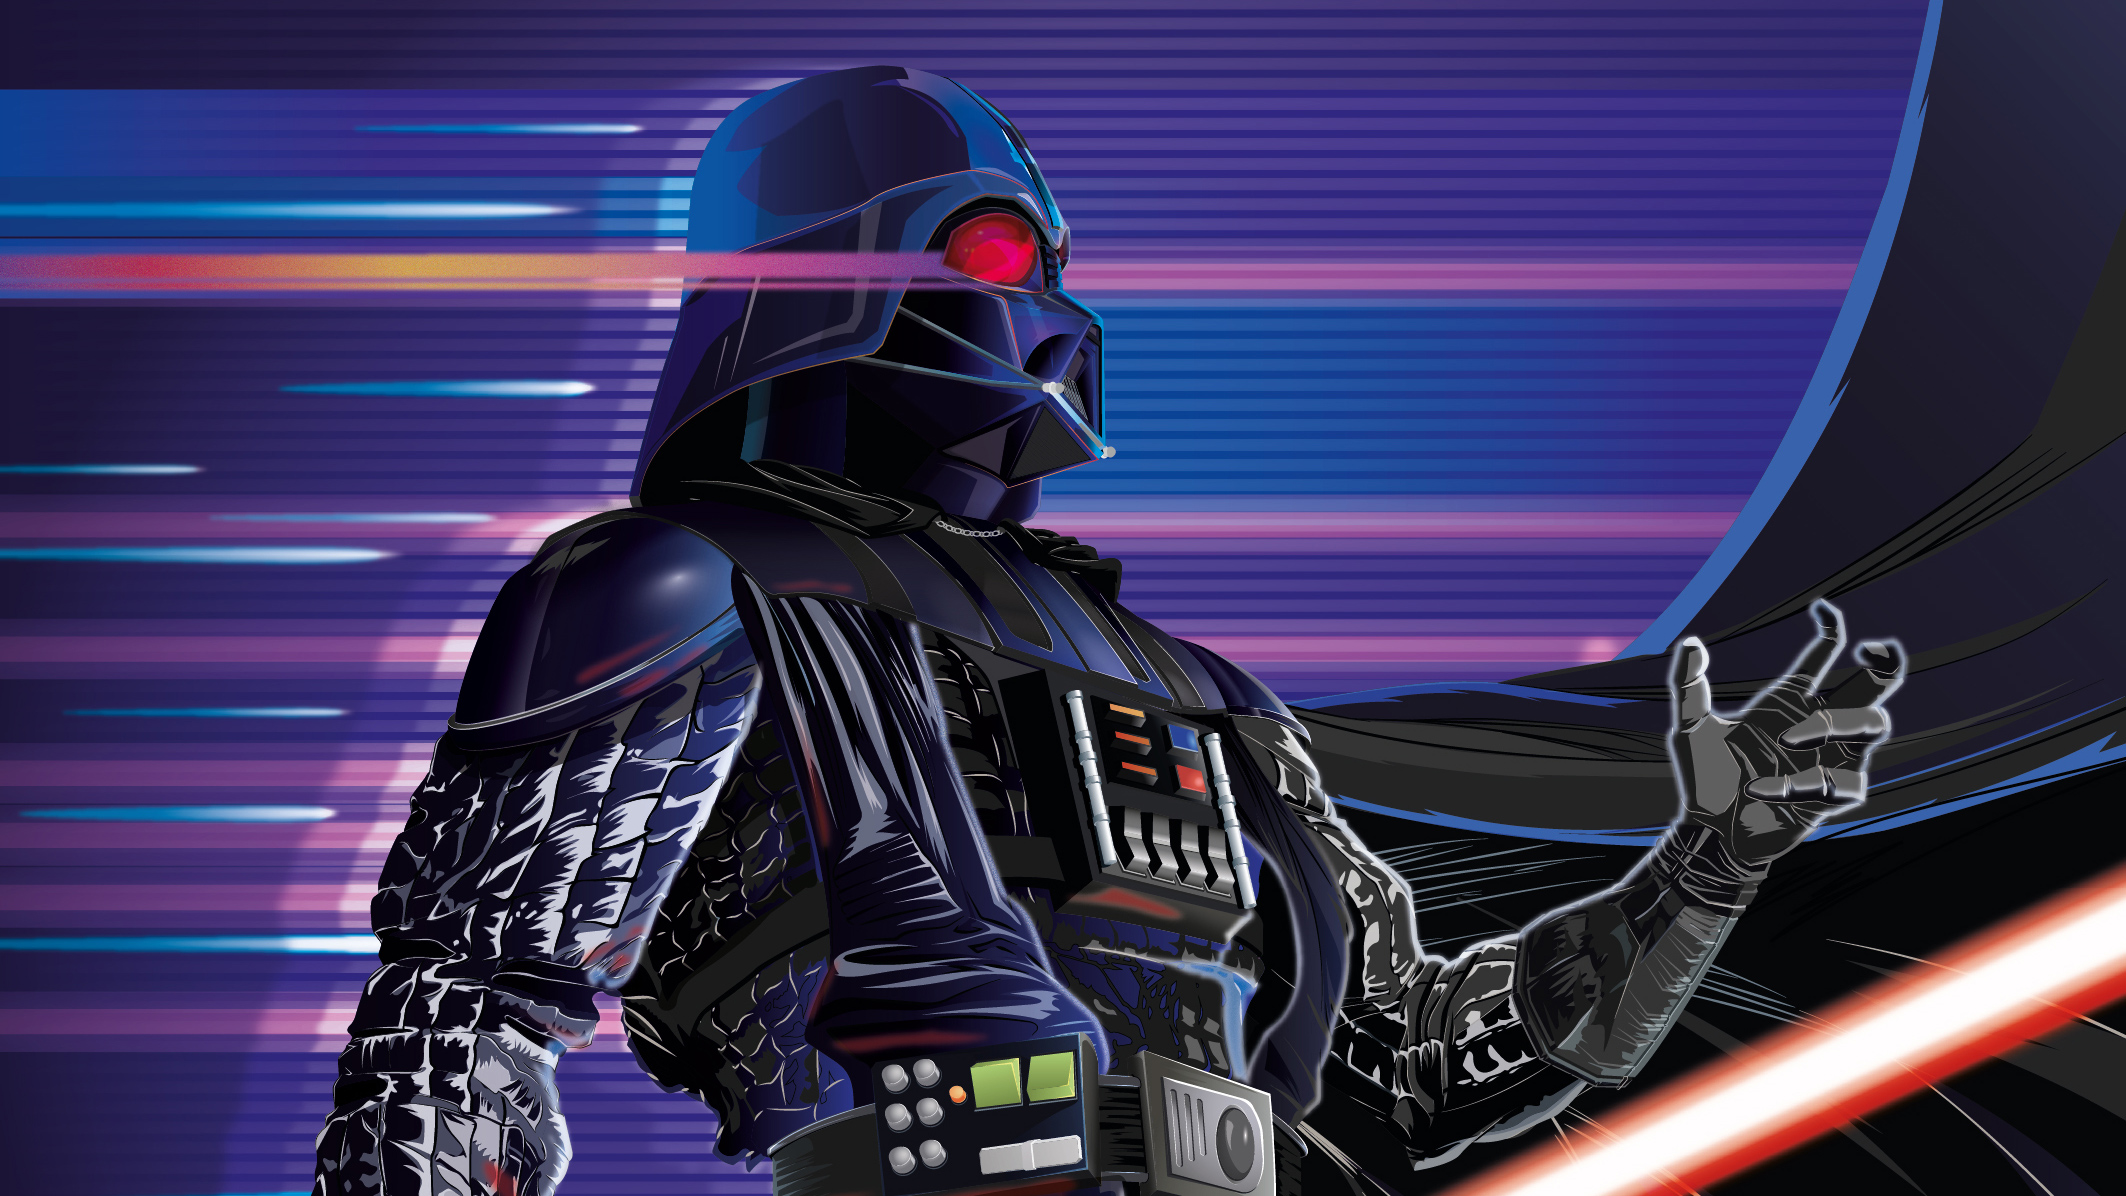 Synthwave Darth Vader Wallpaper Id 5577